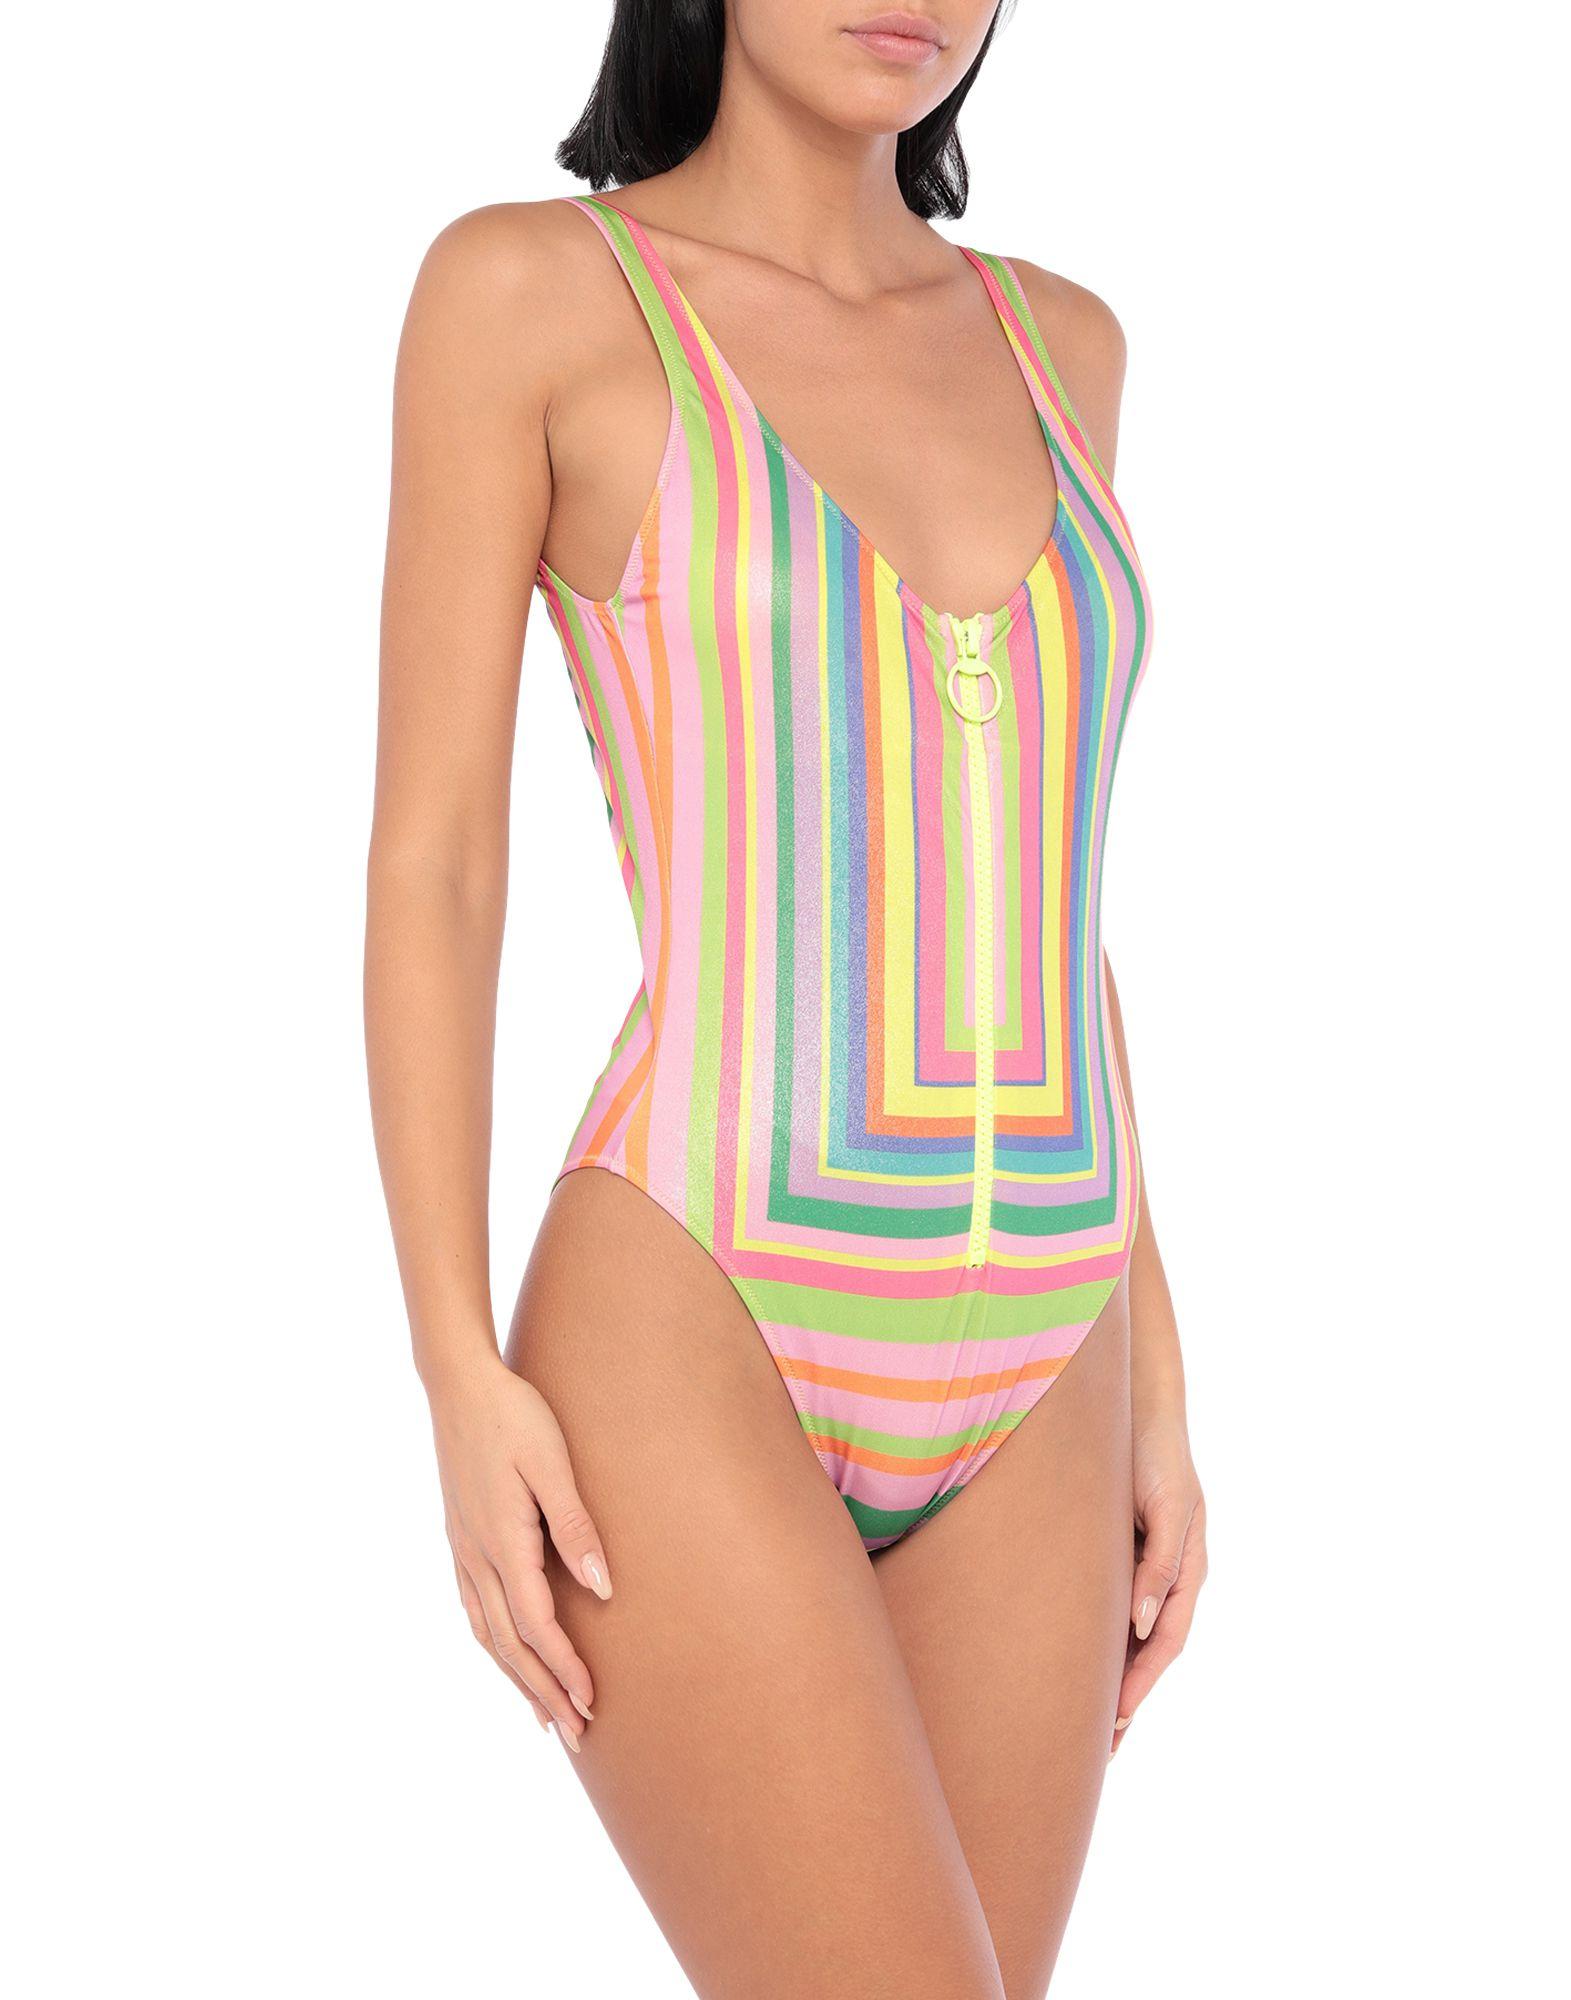 AGOGOA One-piece swimsuits - Item 47242759